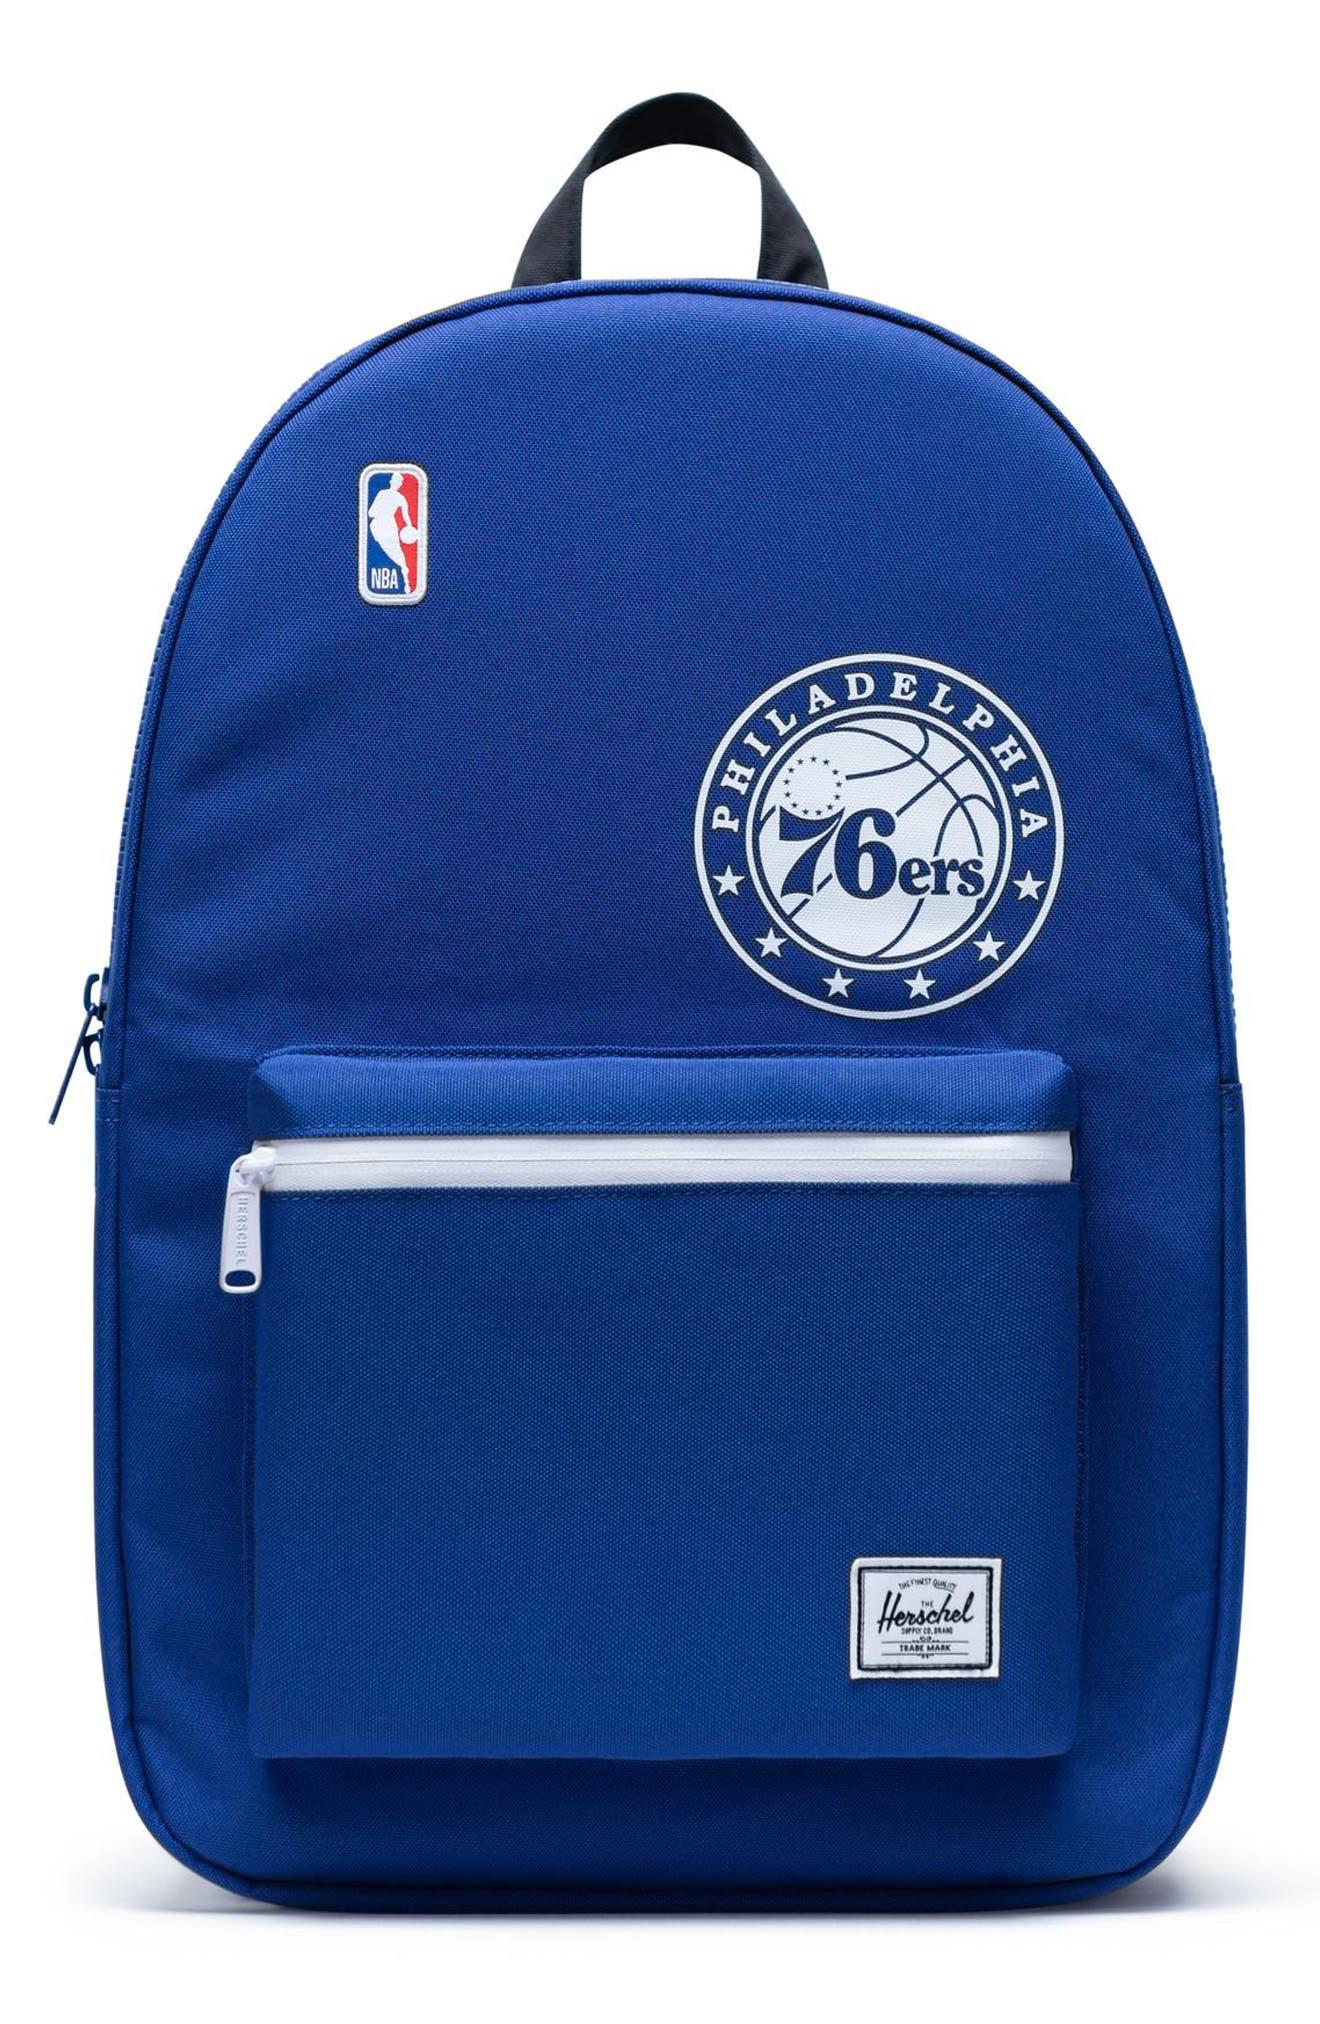 Herschel Supply Co. Settlement Nba Champions 15-Inch Laptop Backpack - Blue